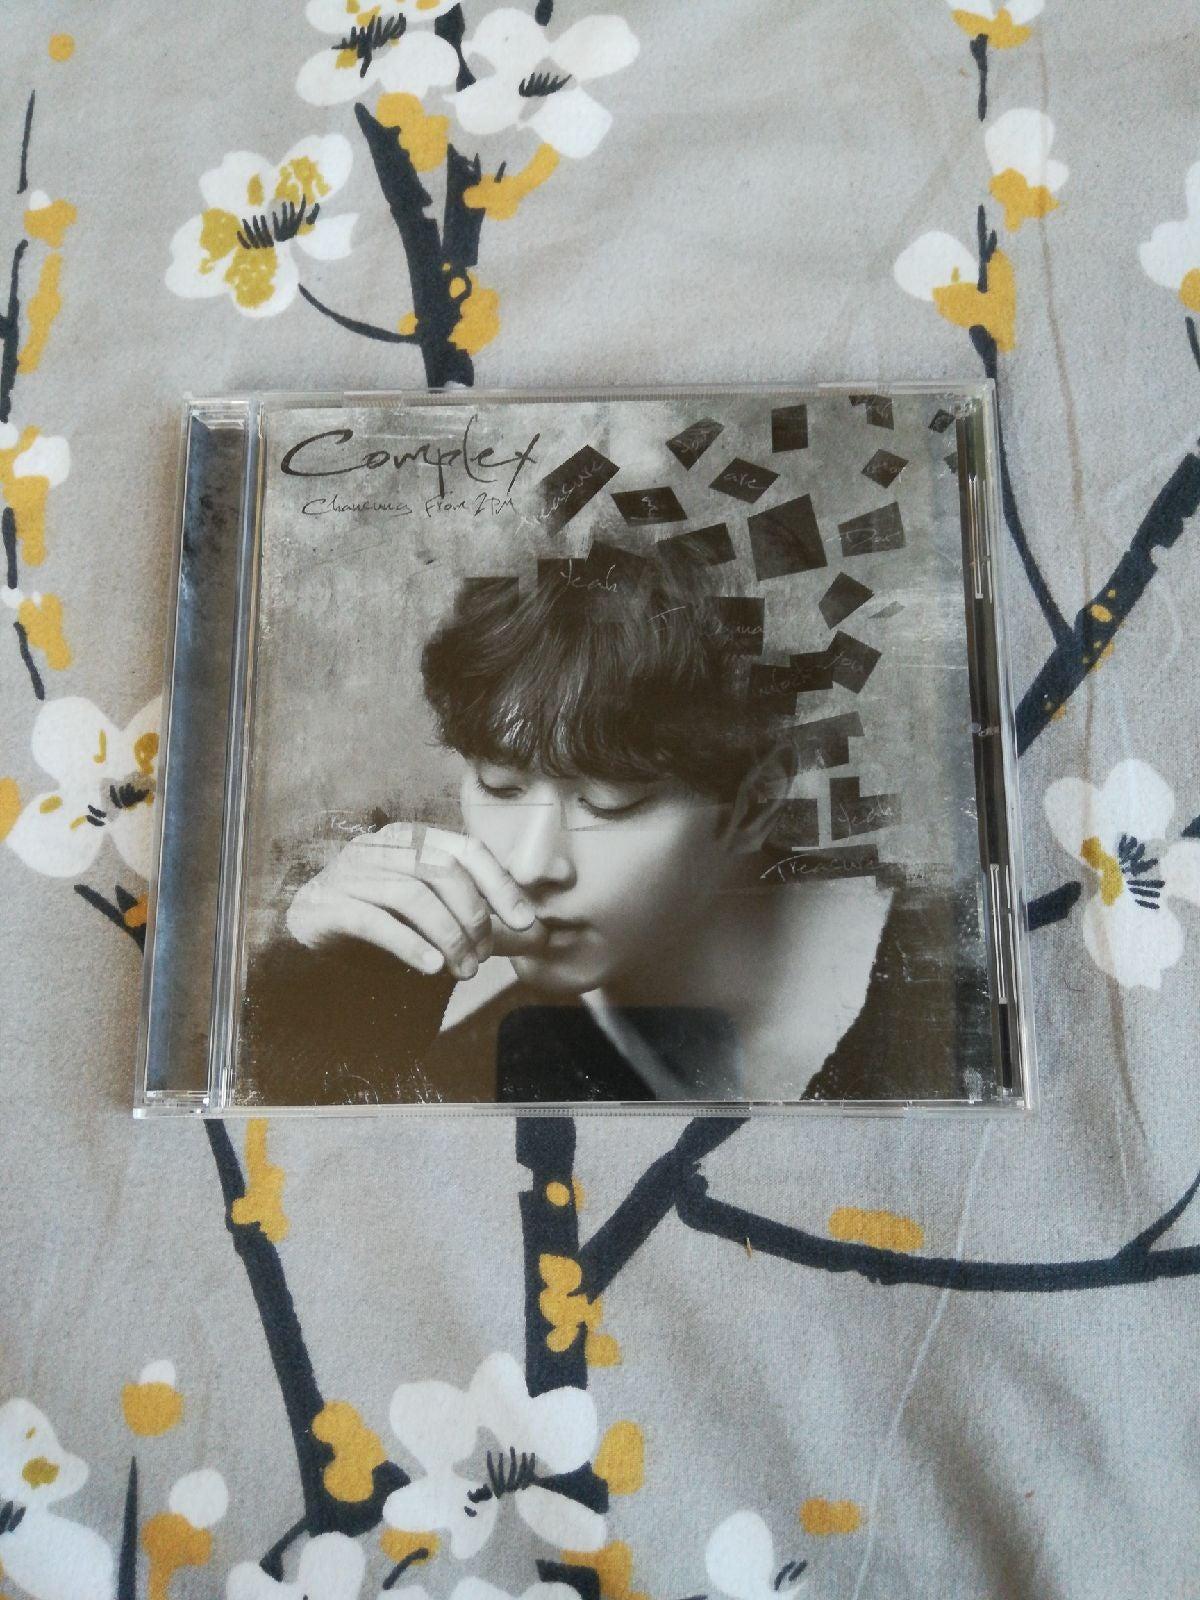 2PM Chansung complex Japan regular cd